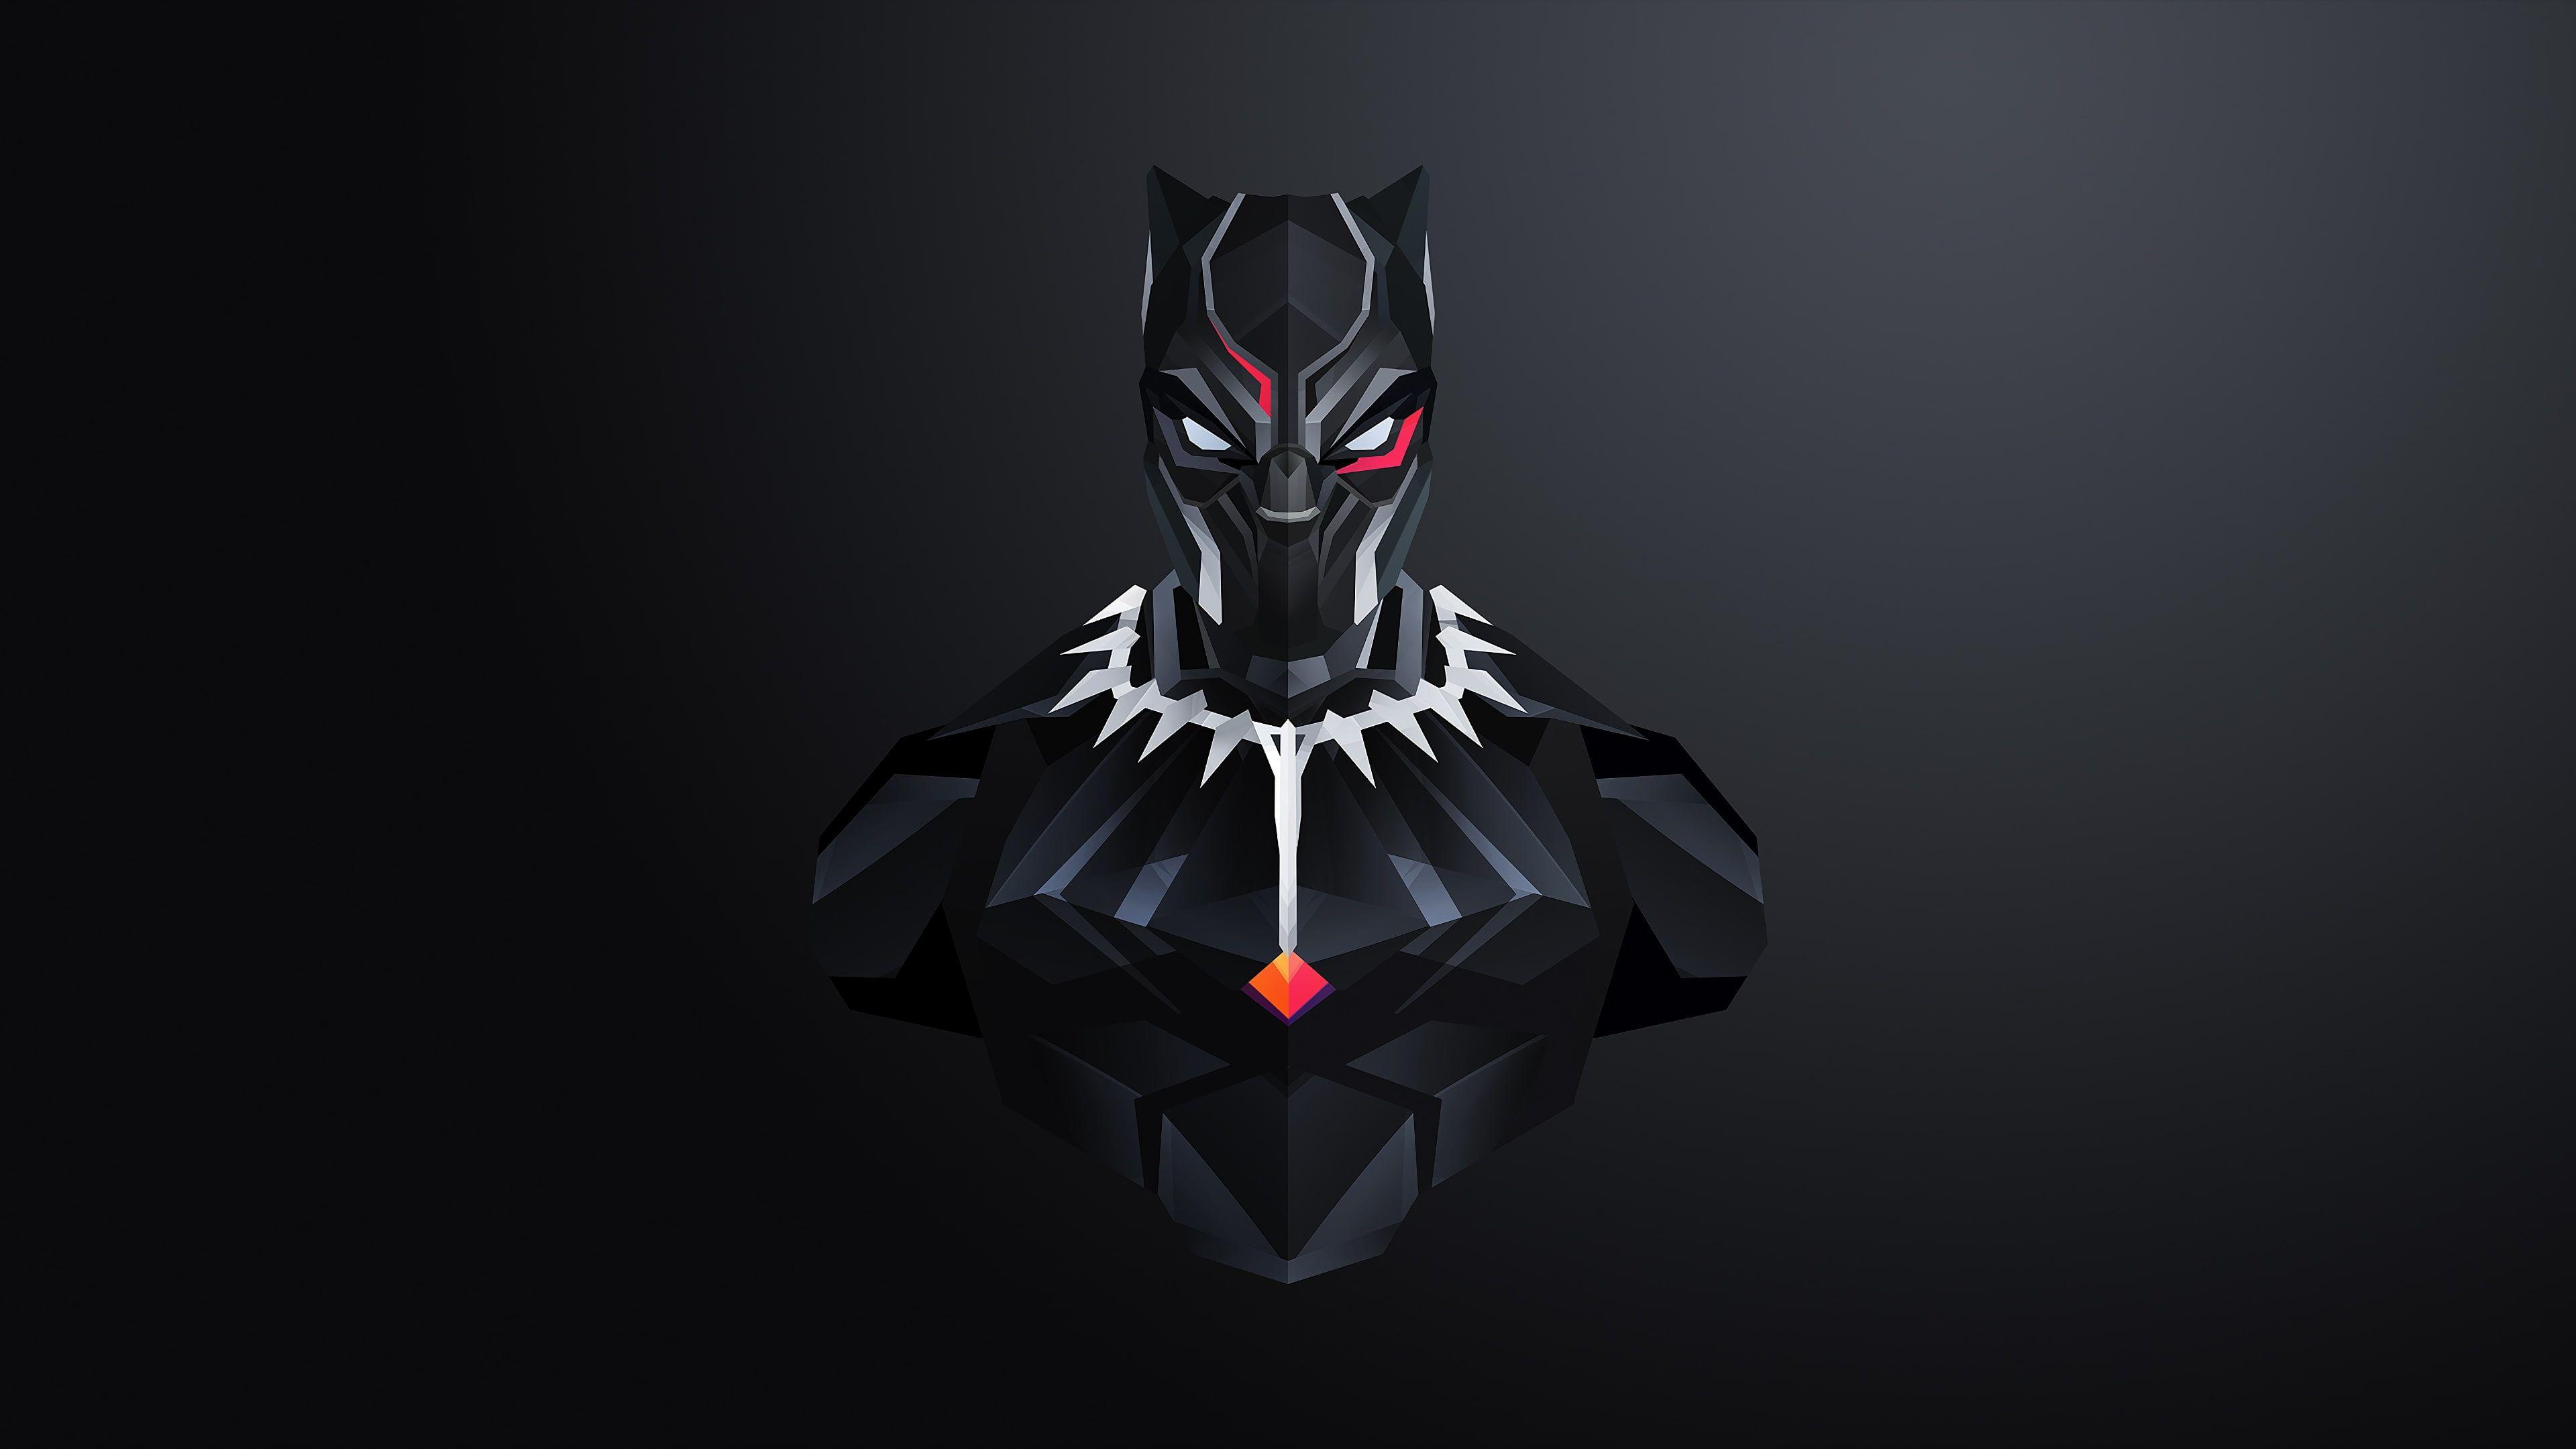 4k Minimal Black Panther 4k Wallpaper Hdwallpaper Desktop In 2020 Black Panther Marvel Black Panther Art Marvel